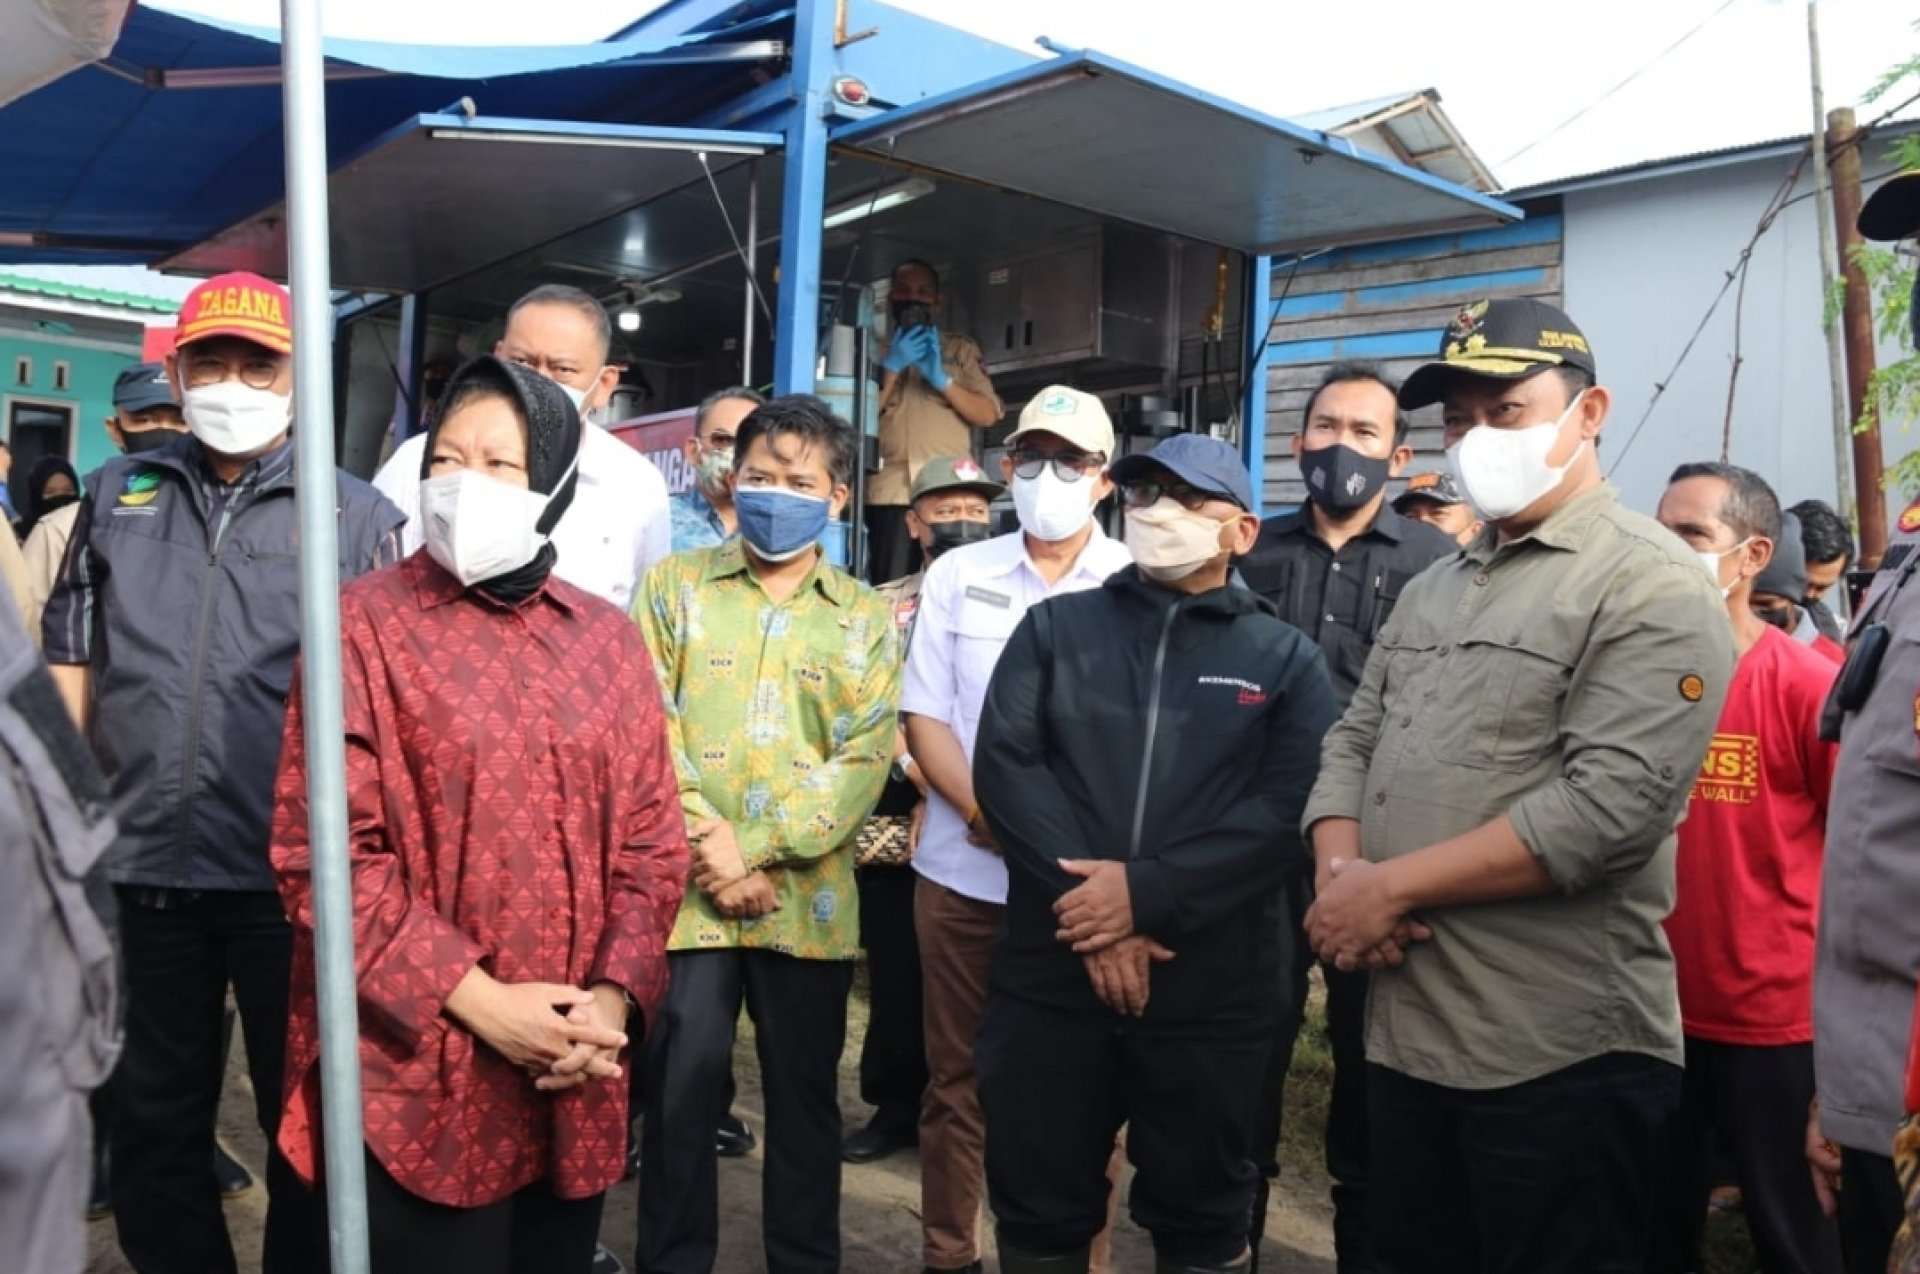 Kunjungan ke Kalteng, Mensos Tri Rismaharini Didampingi Wagub Edy Pratowo Tinjau Lokasi Banjir dan Salurkan Bantuan